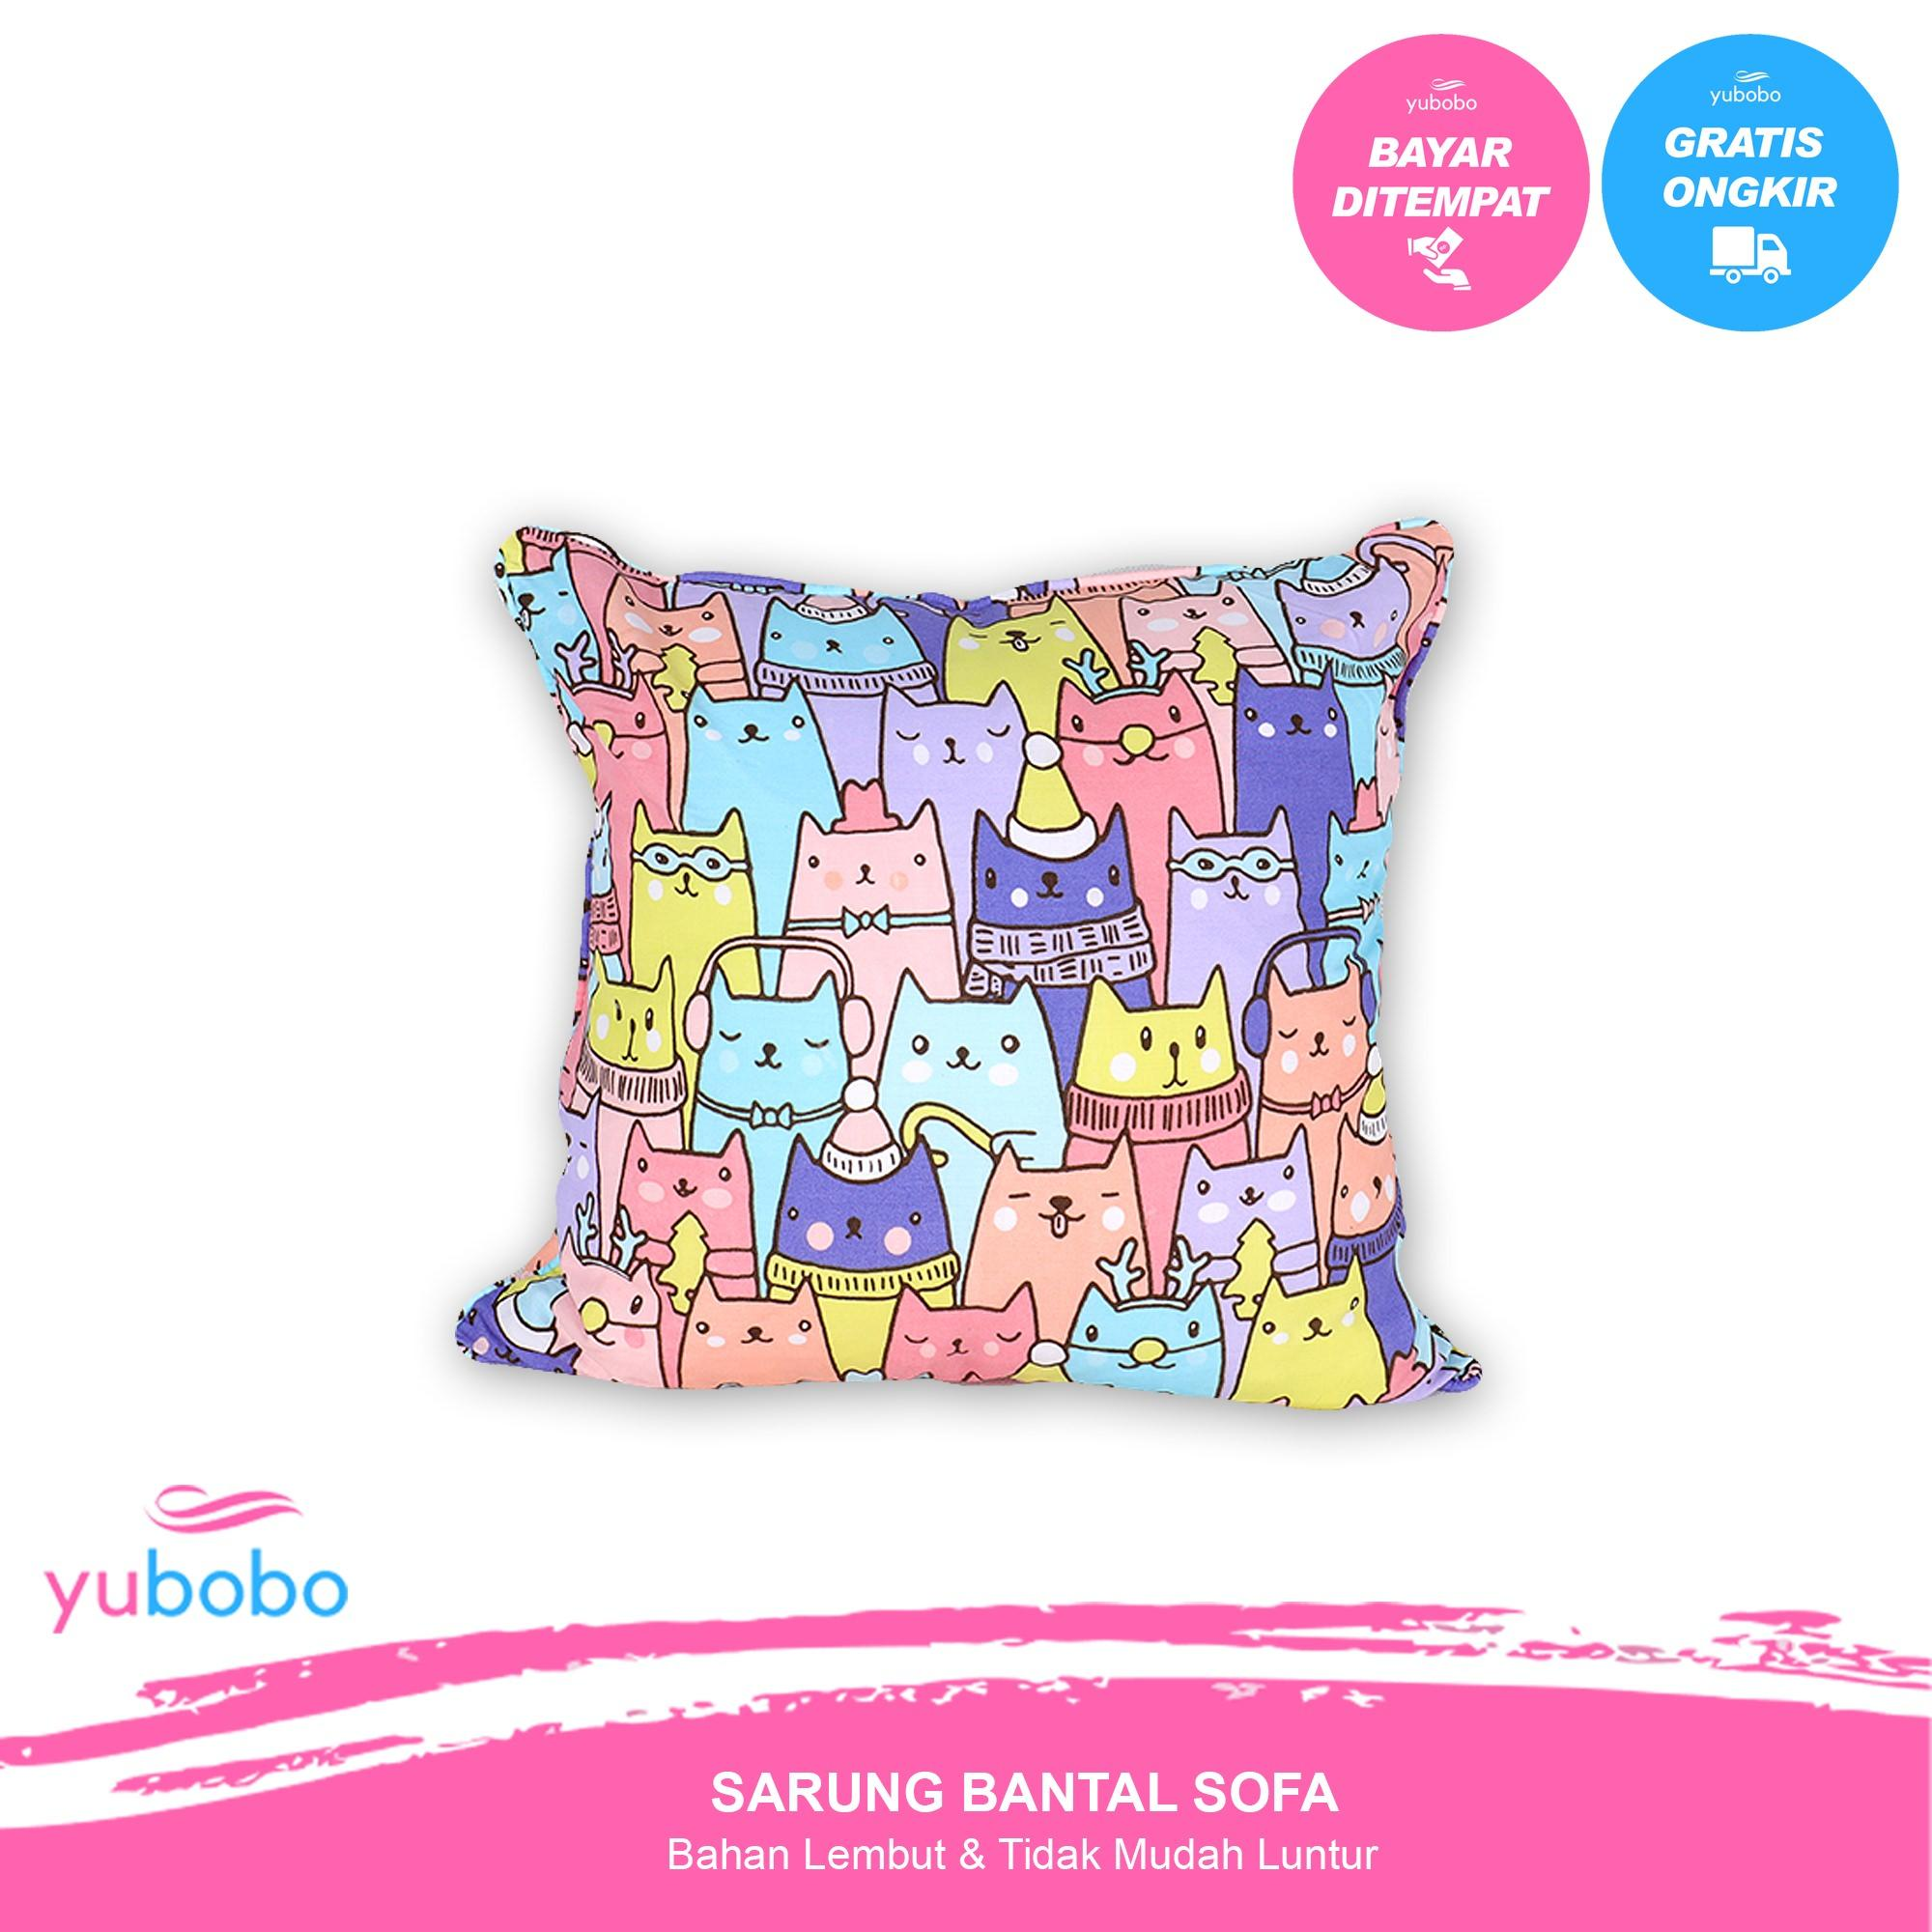 yubobo - Promo (Sarung + Bantal) Sofa Tamu 40 x 40 cm - Kursi - Bantal Standar Hotel  (Sarung + Bantal)